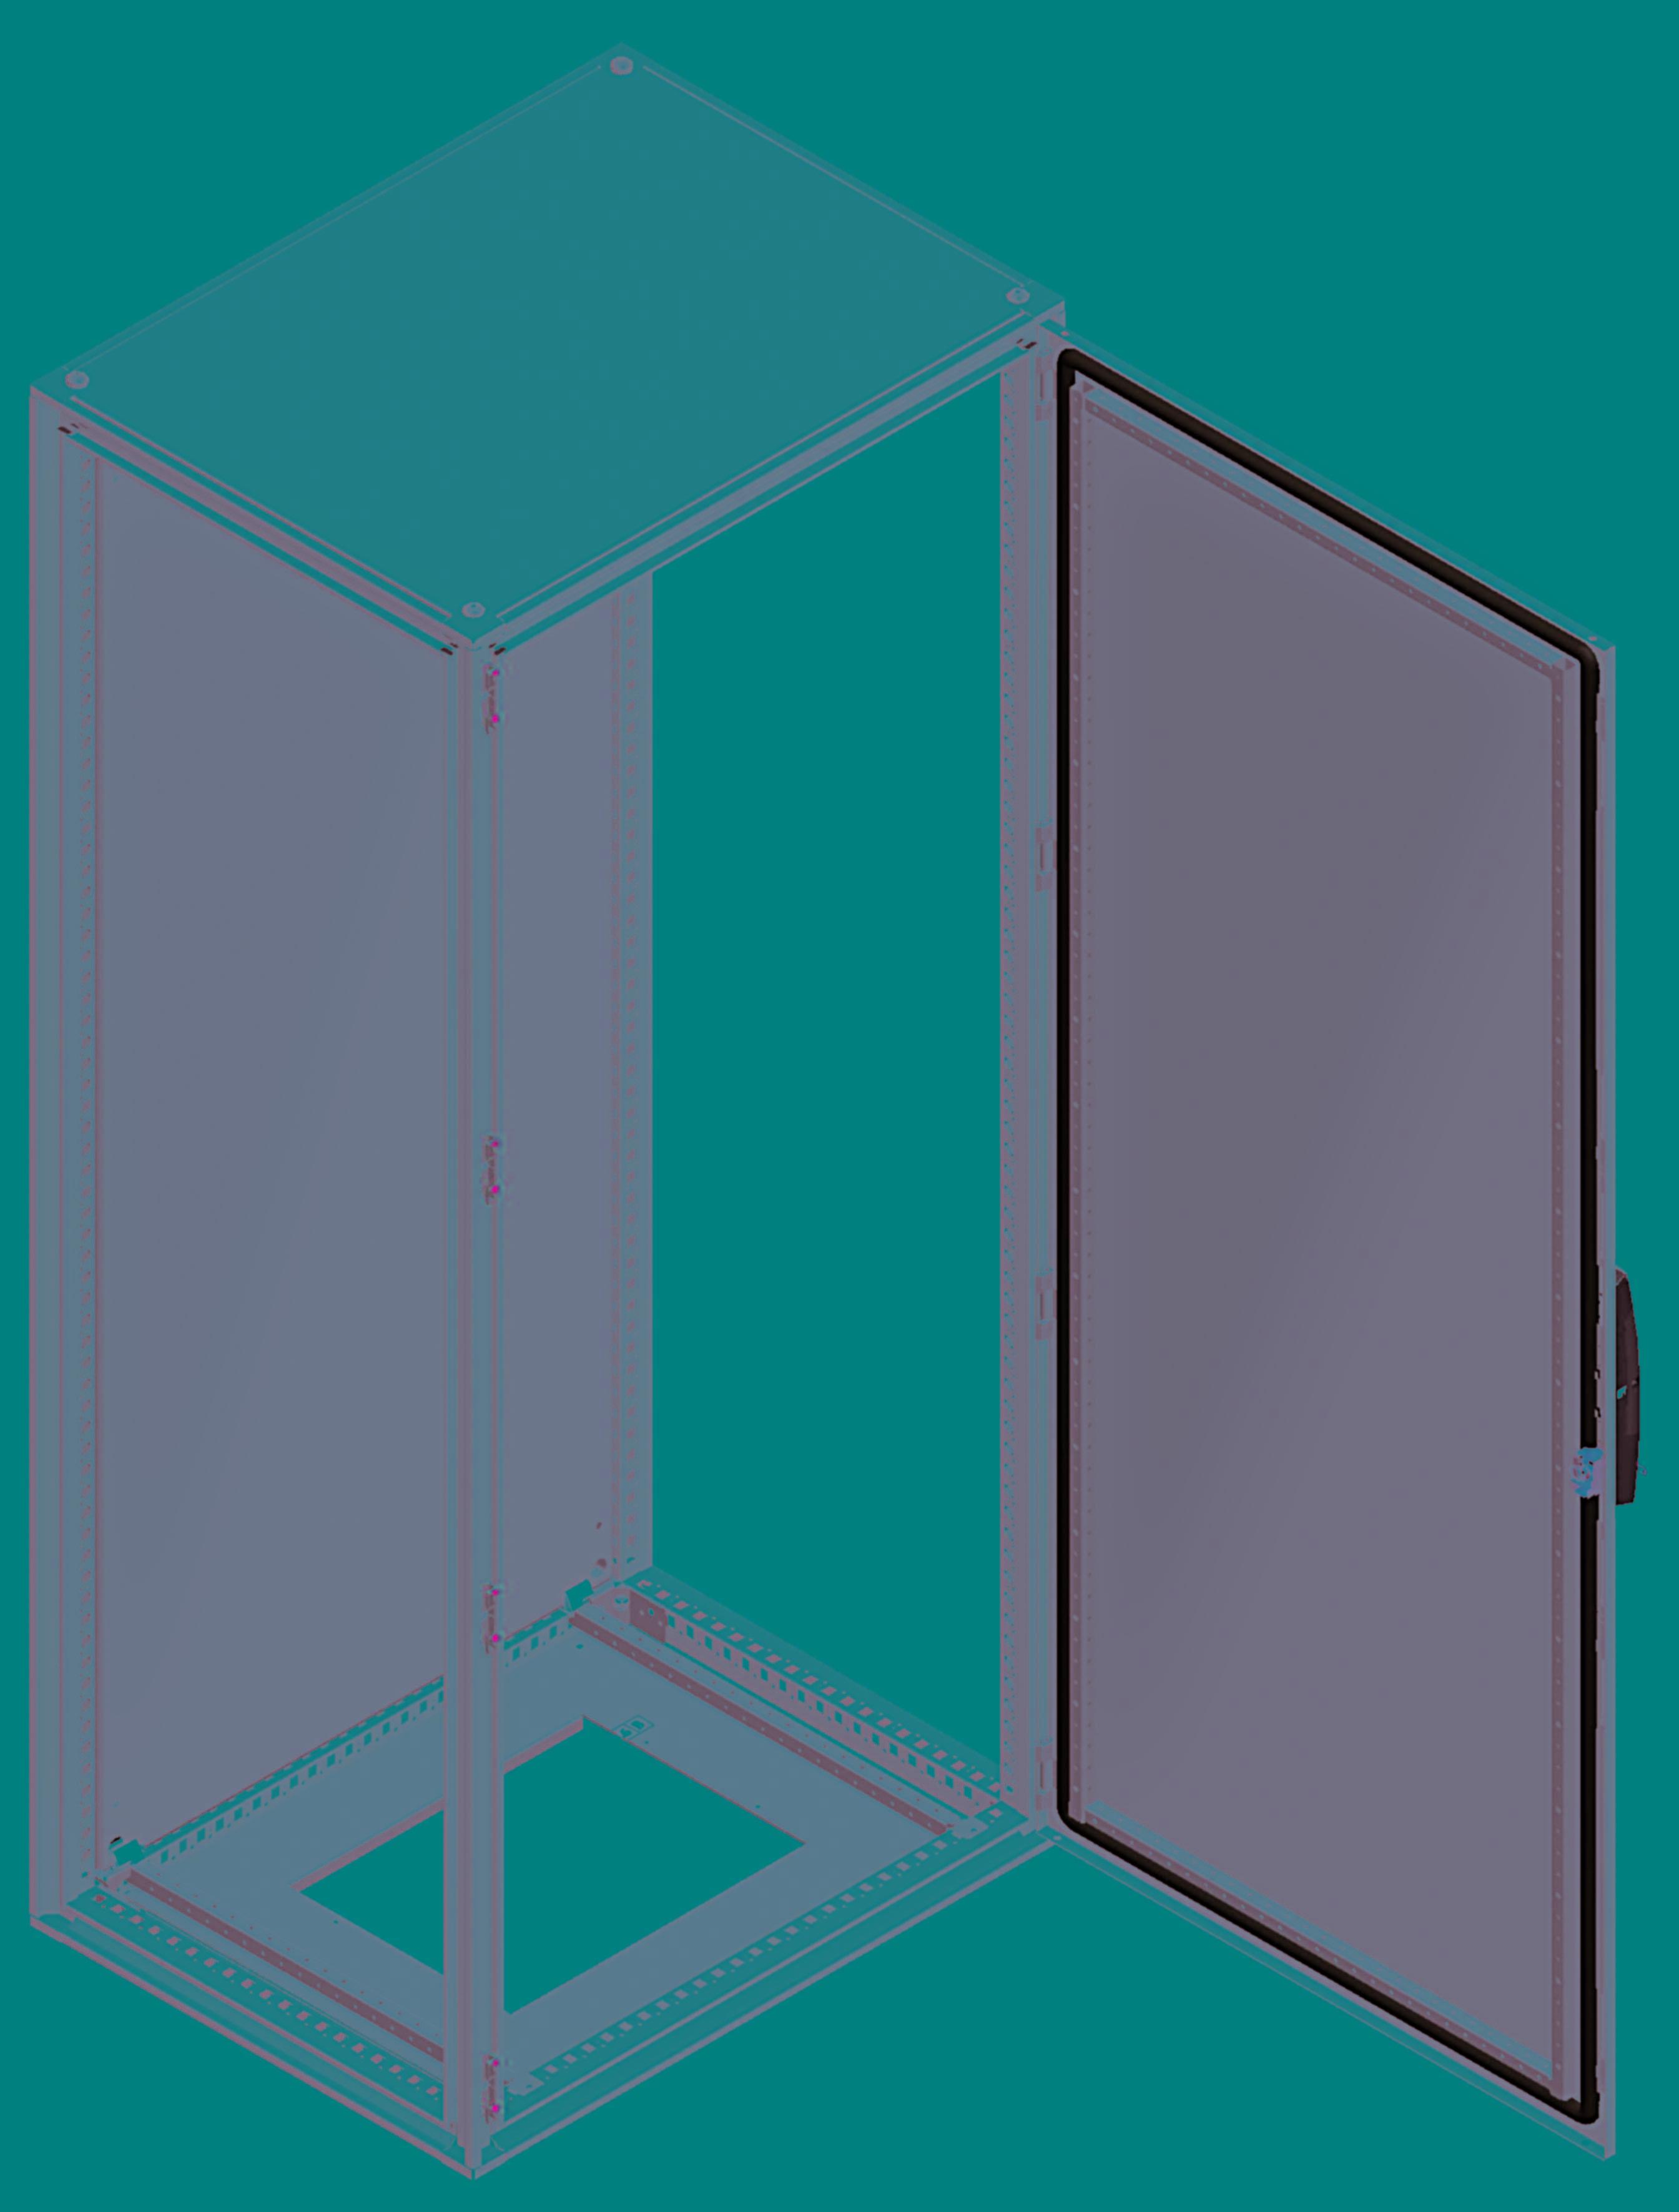 Image Description for https://tedi.itc-electronics.com/itcmedia/images/20190424/YY/__4.jpeg